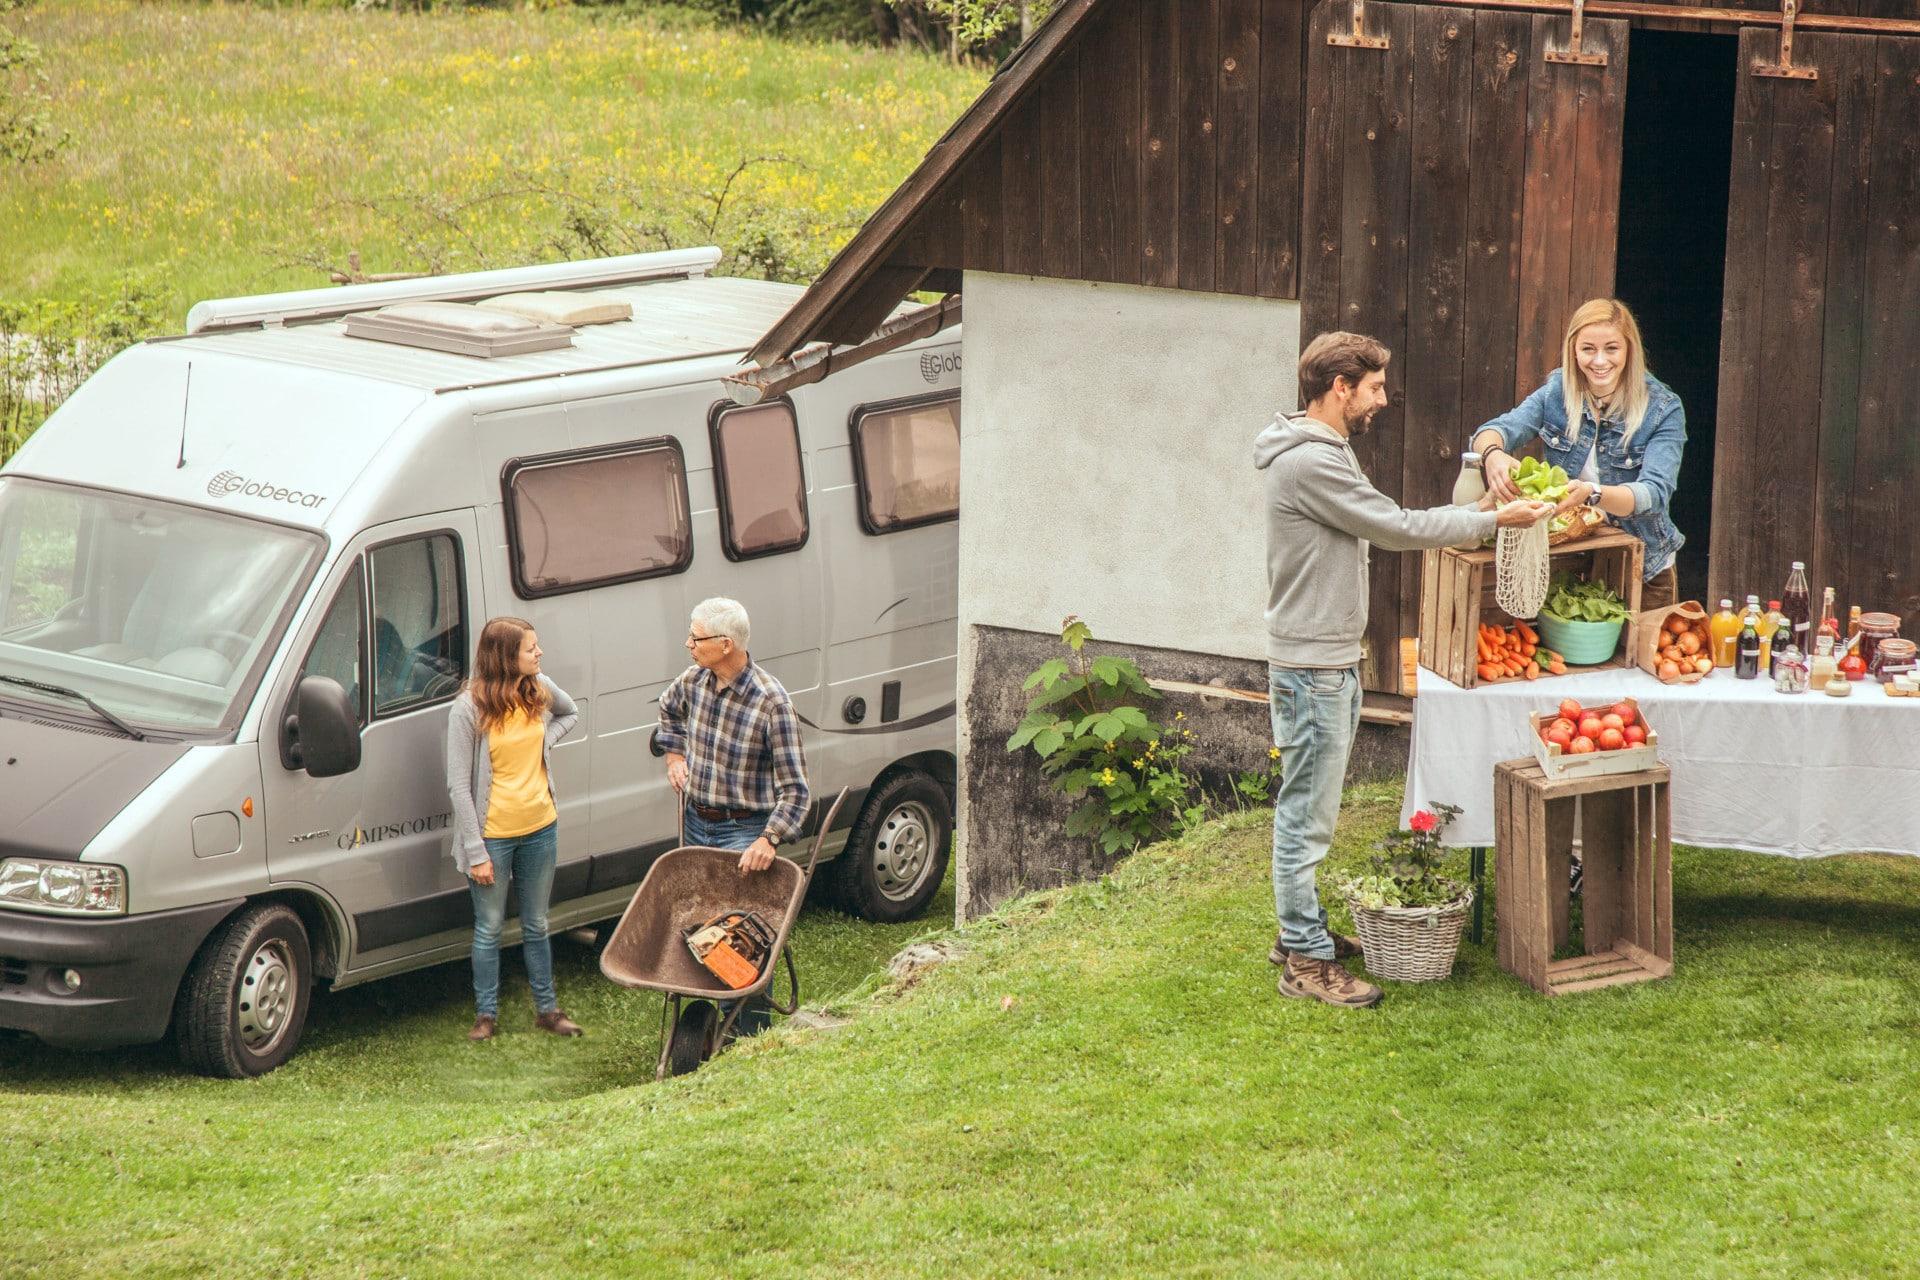 Campen am Bauernhof: Stellplätze gesucht - landwirt-media.com